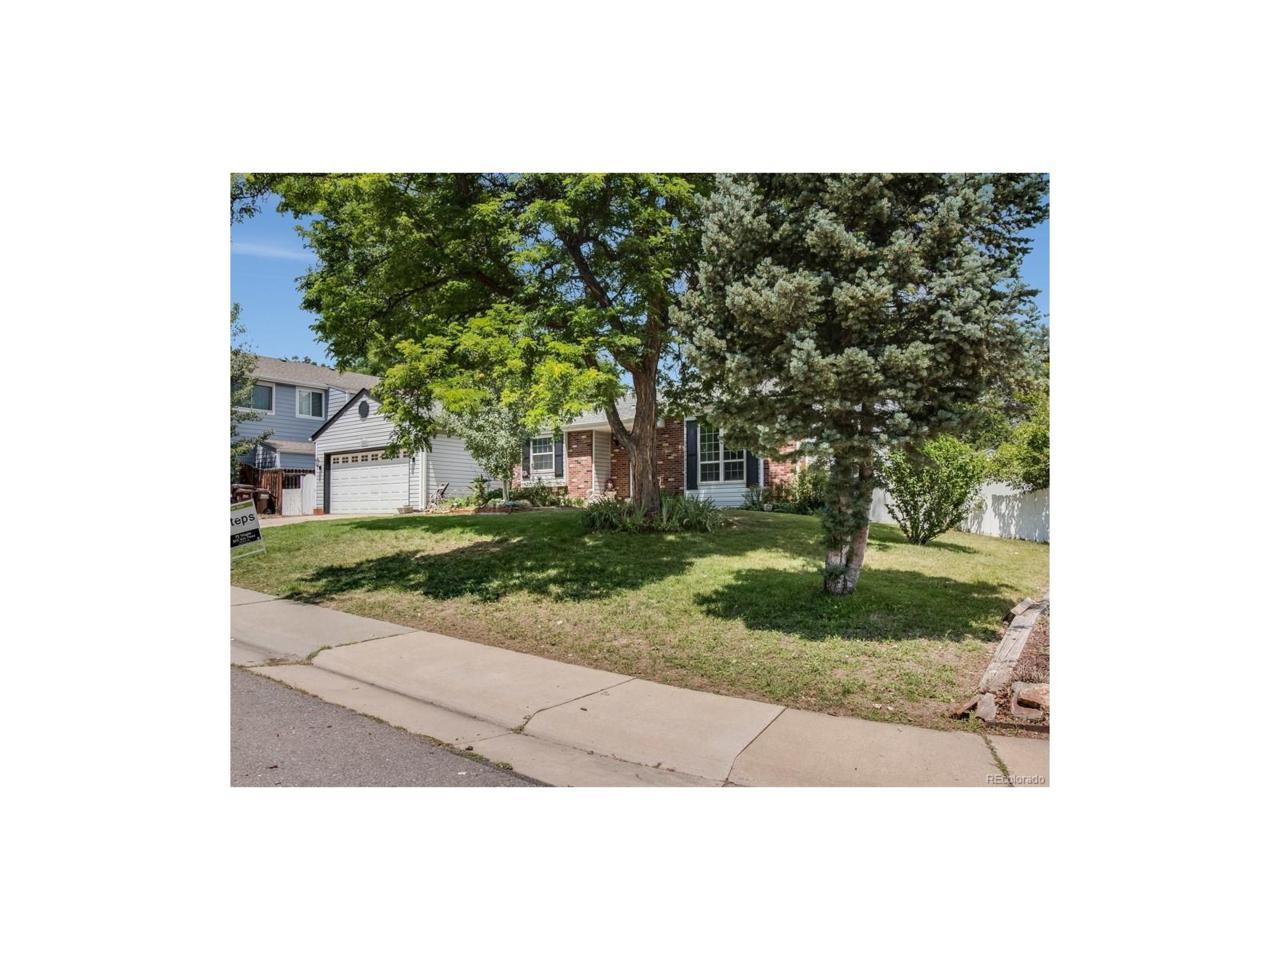 141 Griffith Street, Louisville, CO 80027 (MLS #9678224) :: 8z Real Estate